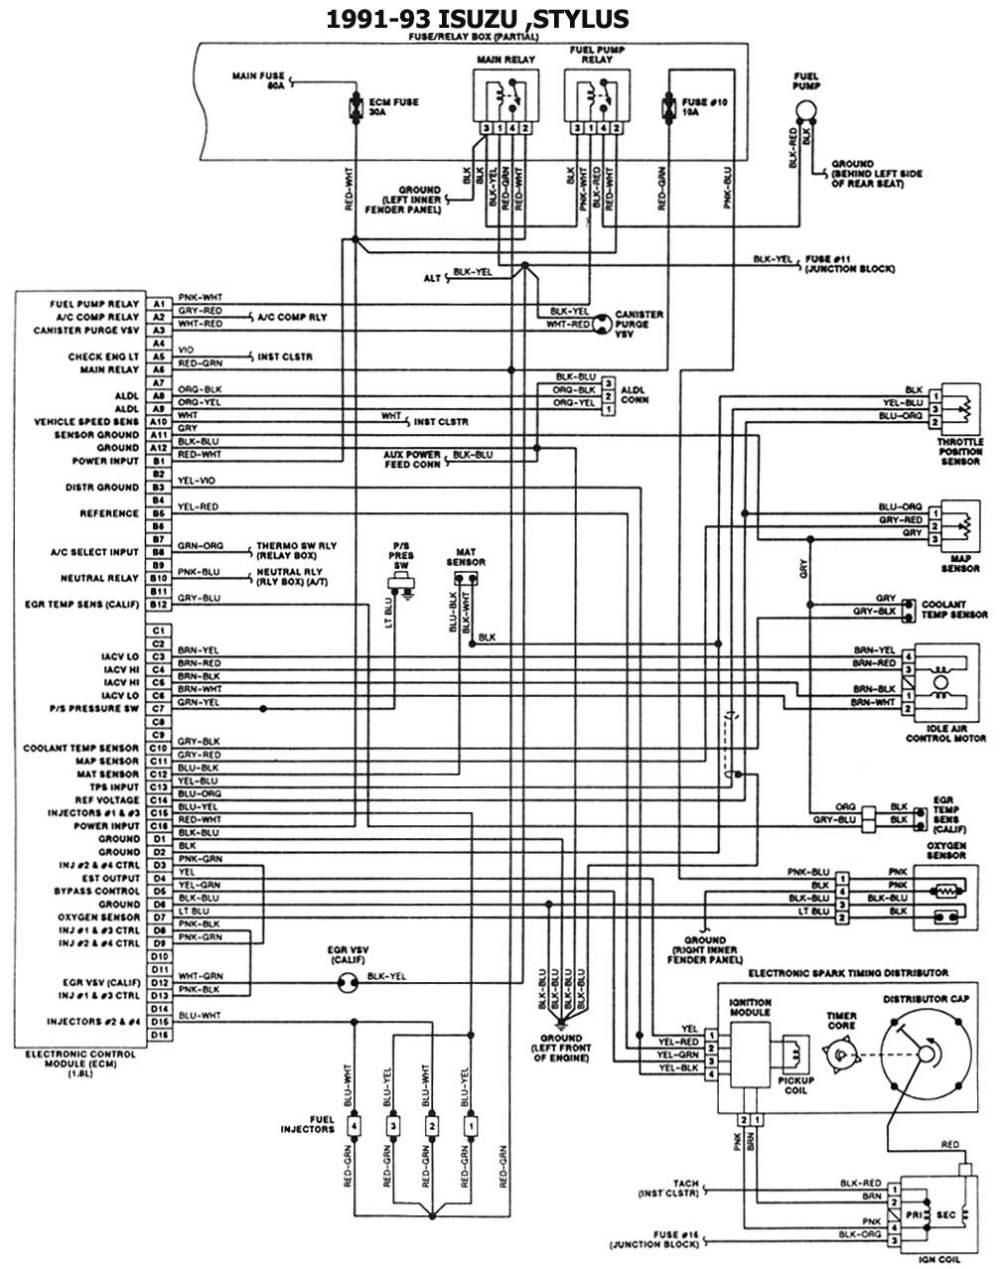 medium resolution of 1991 93 esquemas electricos trooper